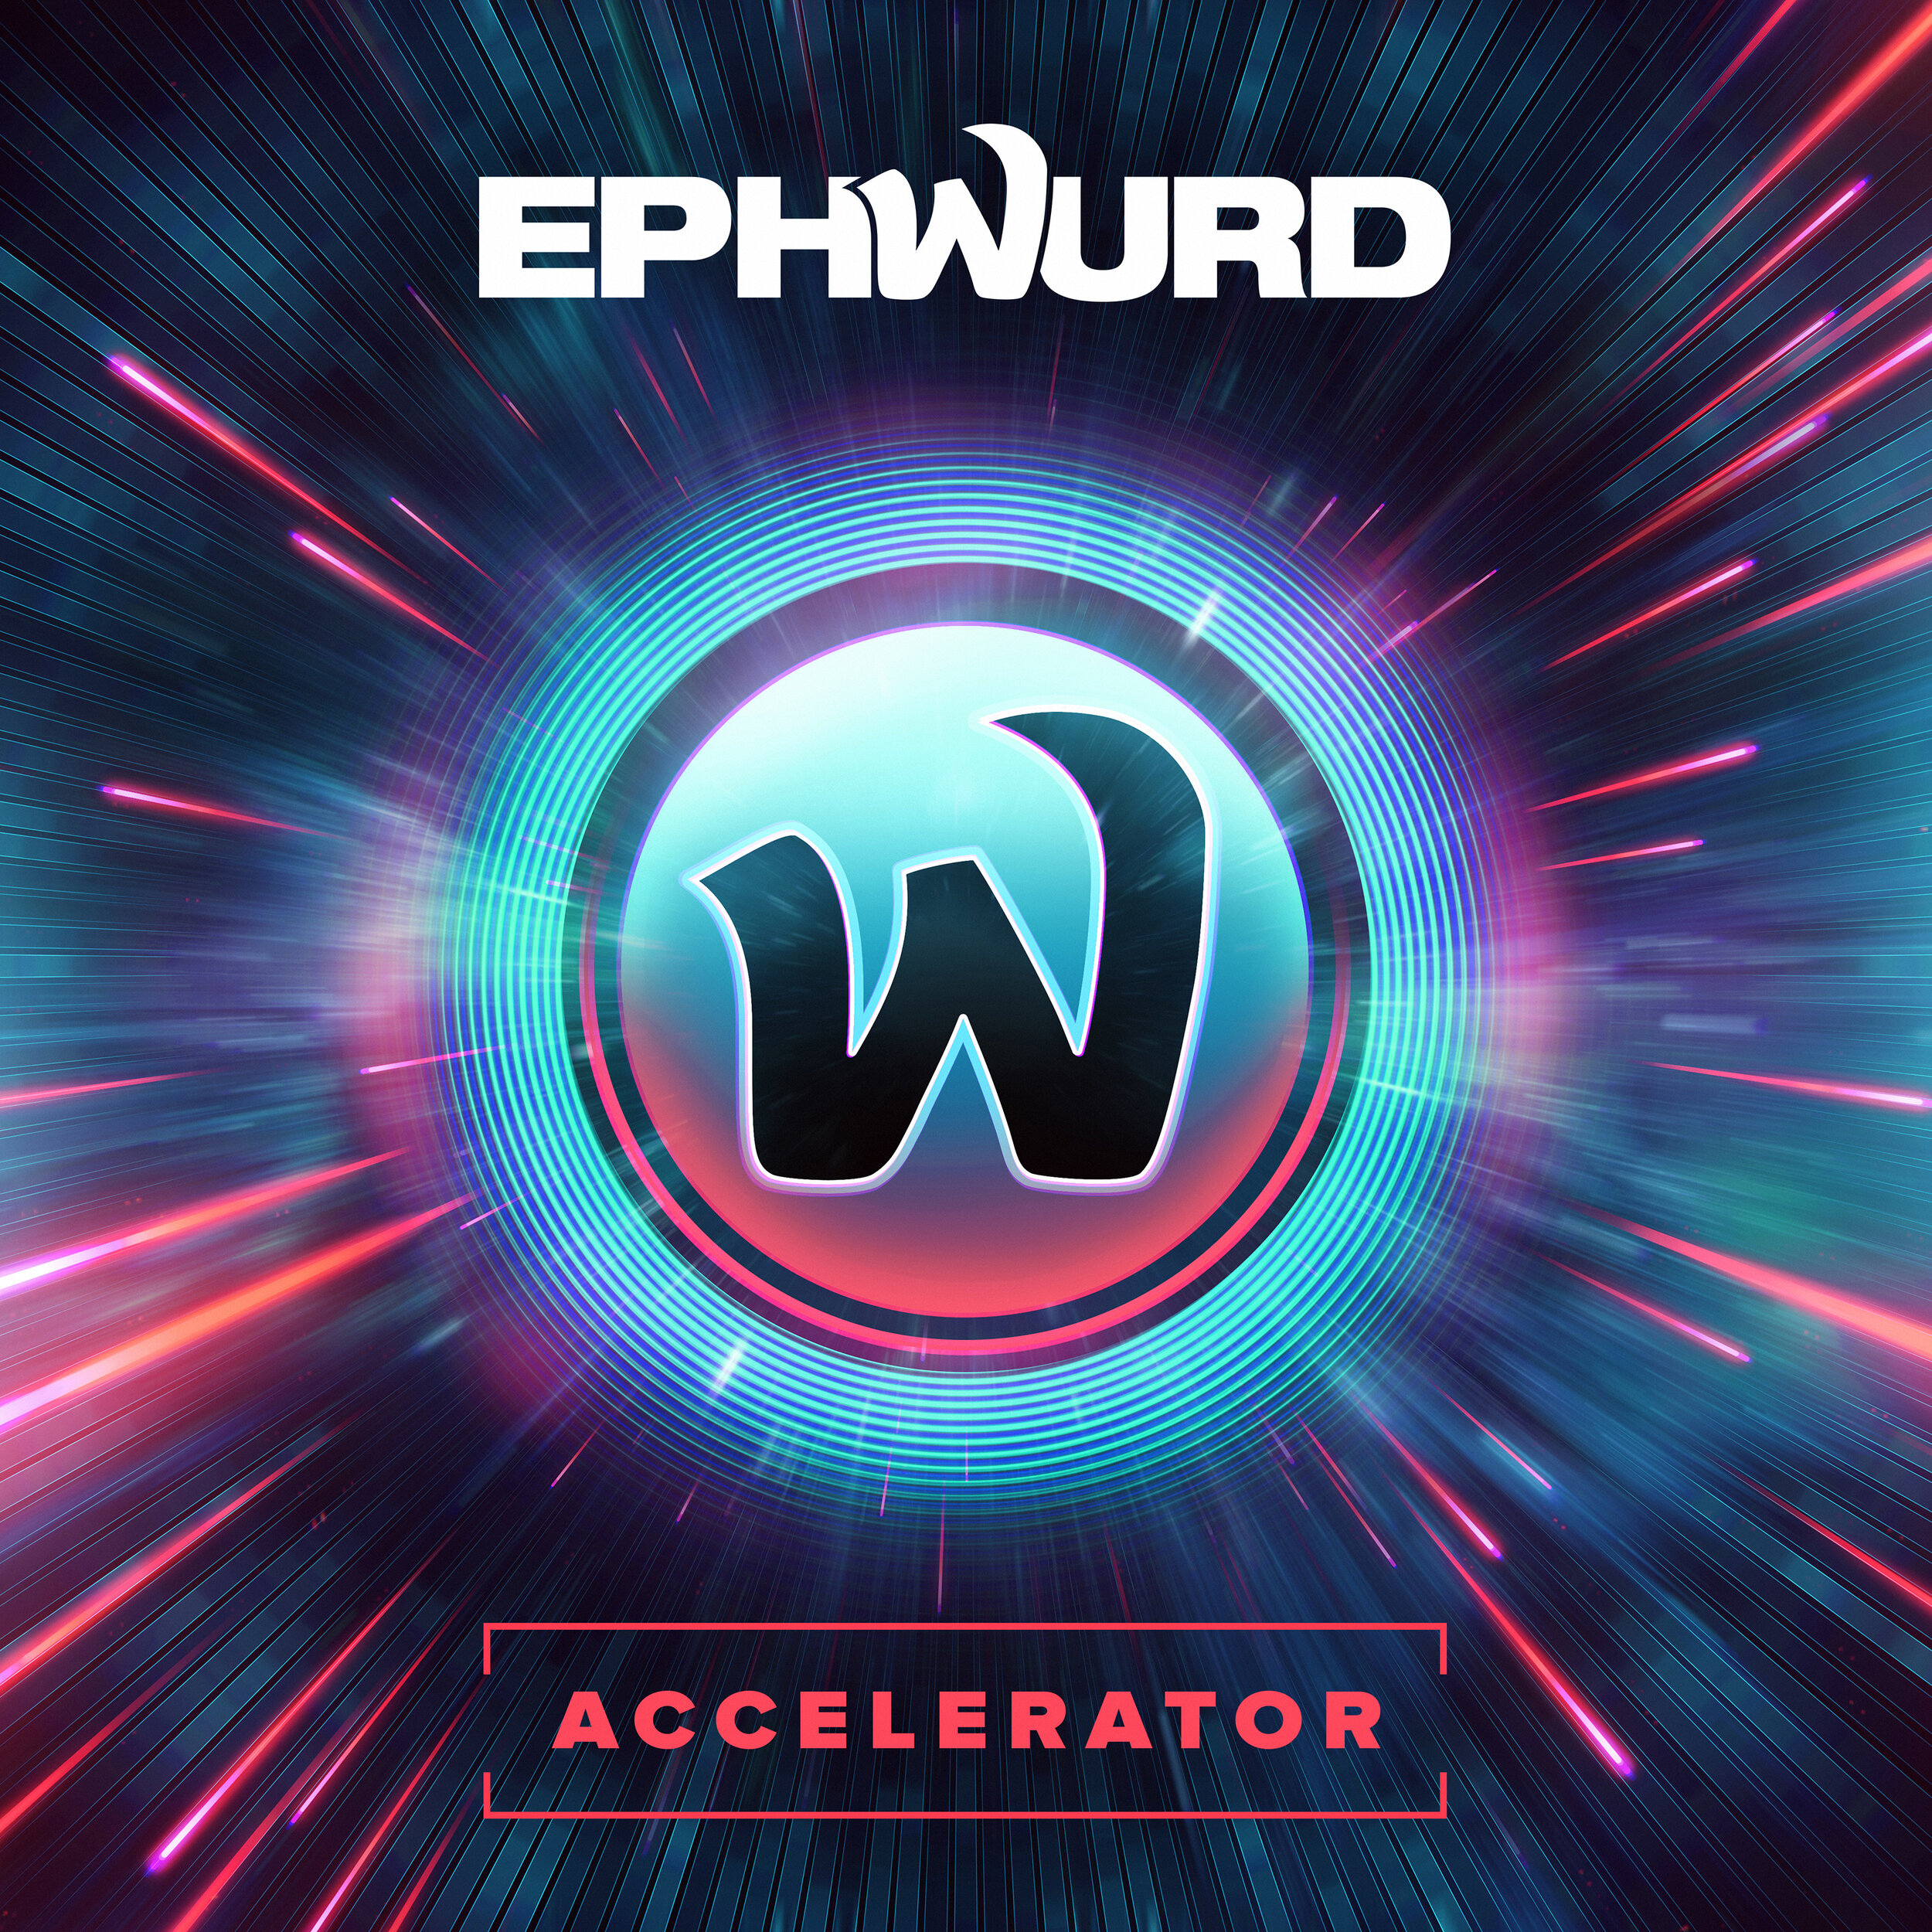 ephwurd_accelerator_art_3000px.jpg